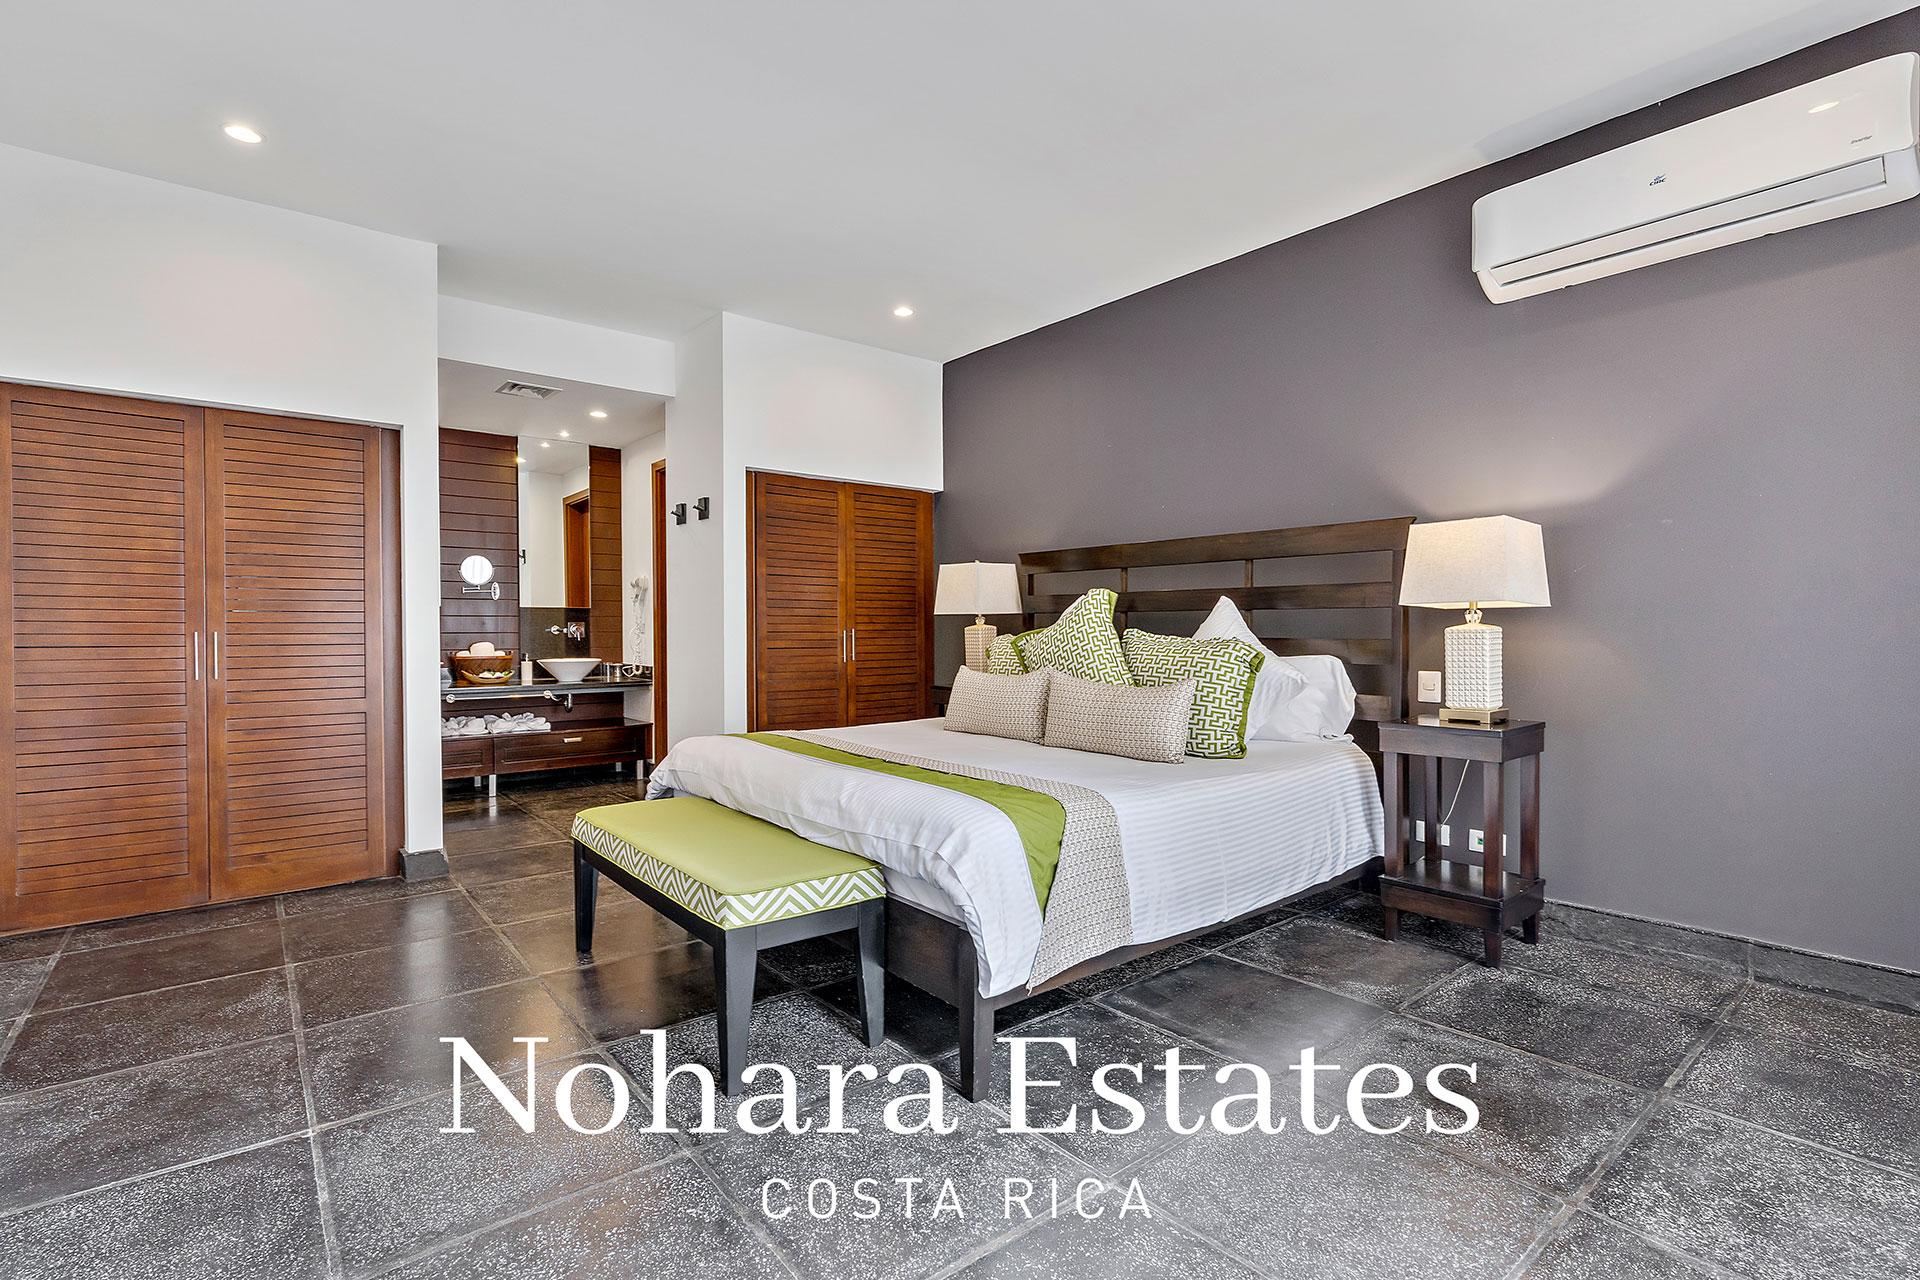 Nohara Estates Costa Rica 125 Apartment Quepos Los Altos 7